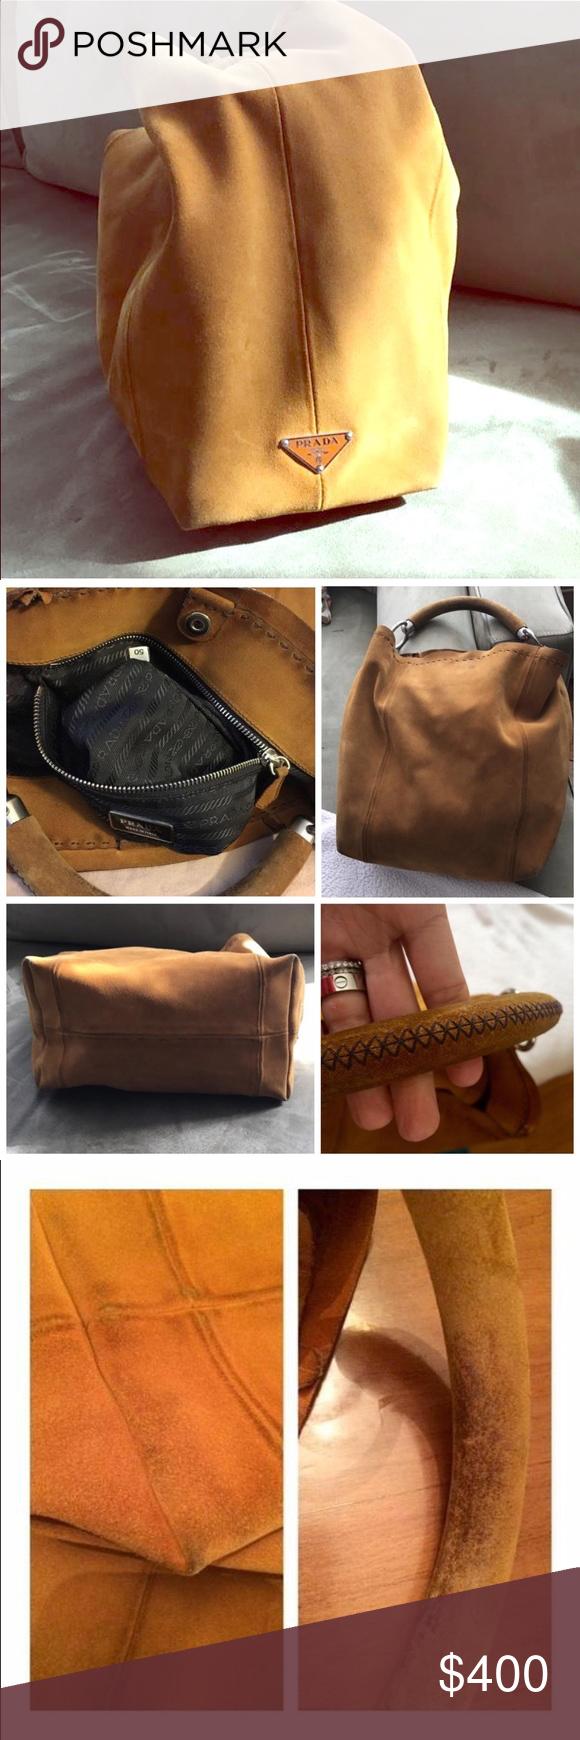 100% Authentic PRADA Suede Hobo Bag Auth PRADA Daino Leather Woven Handle Brown  Handbag Suede 1957dbf04d